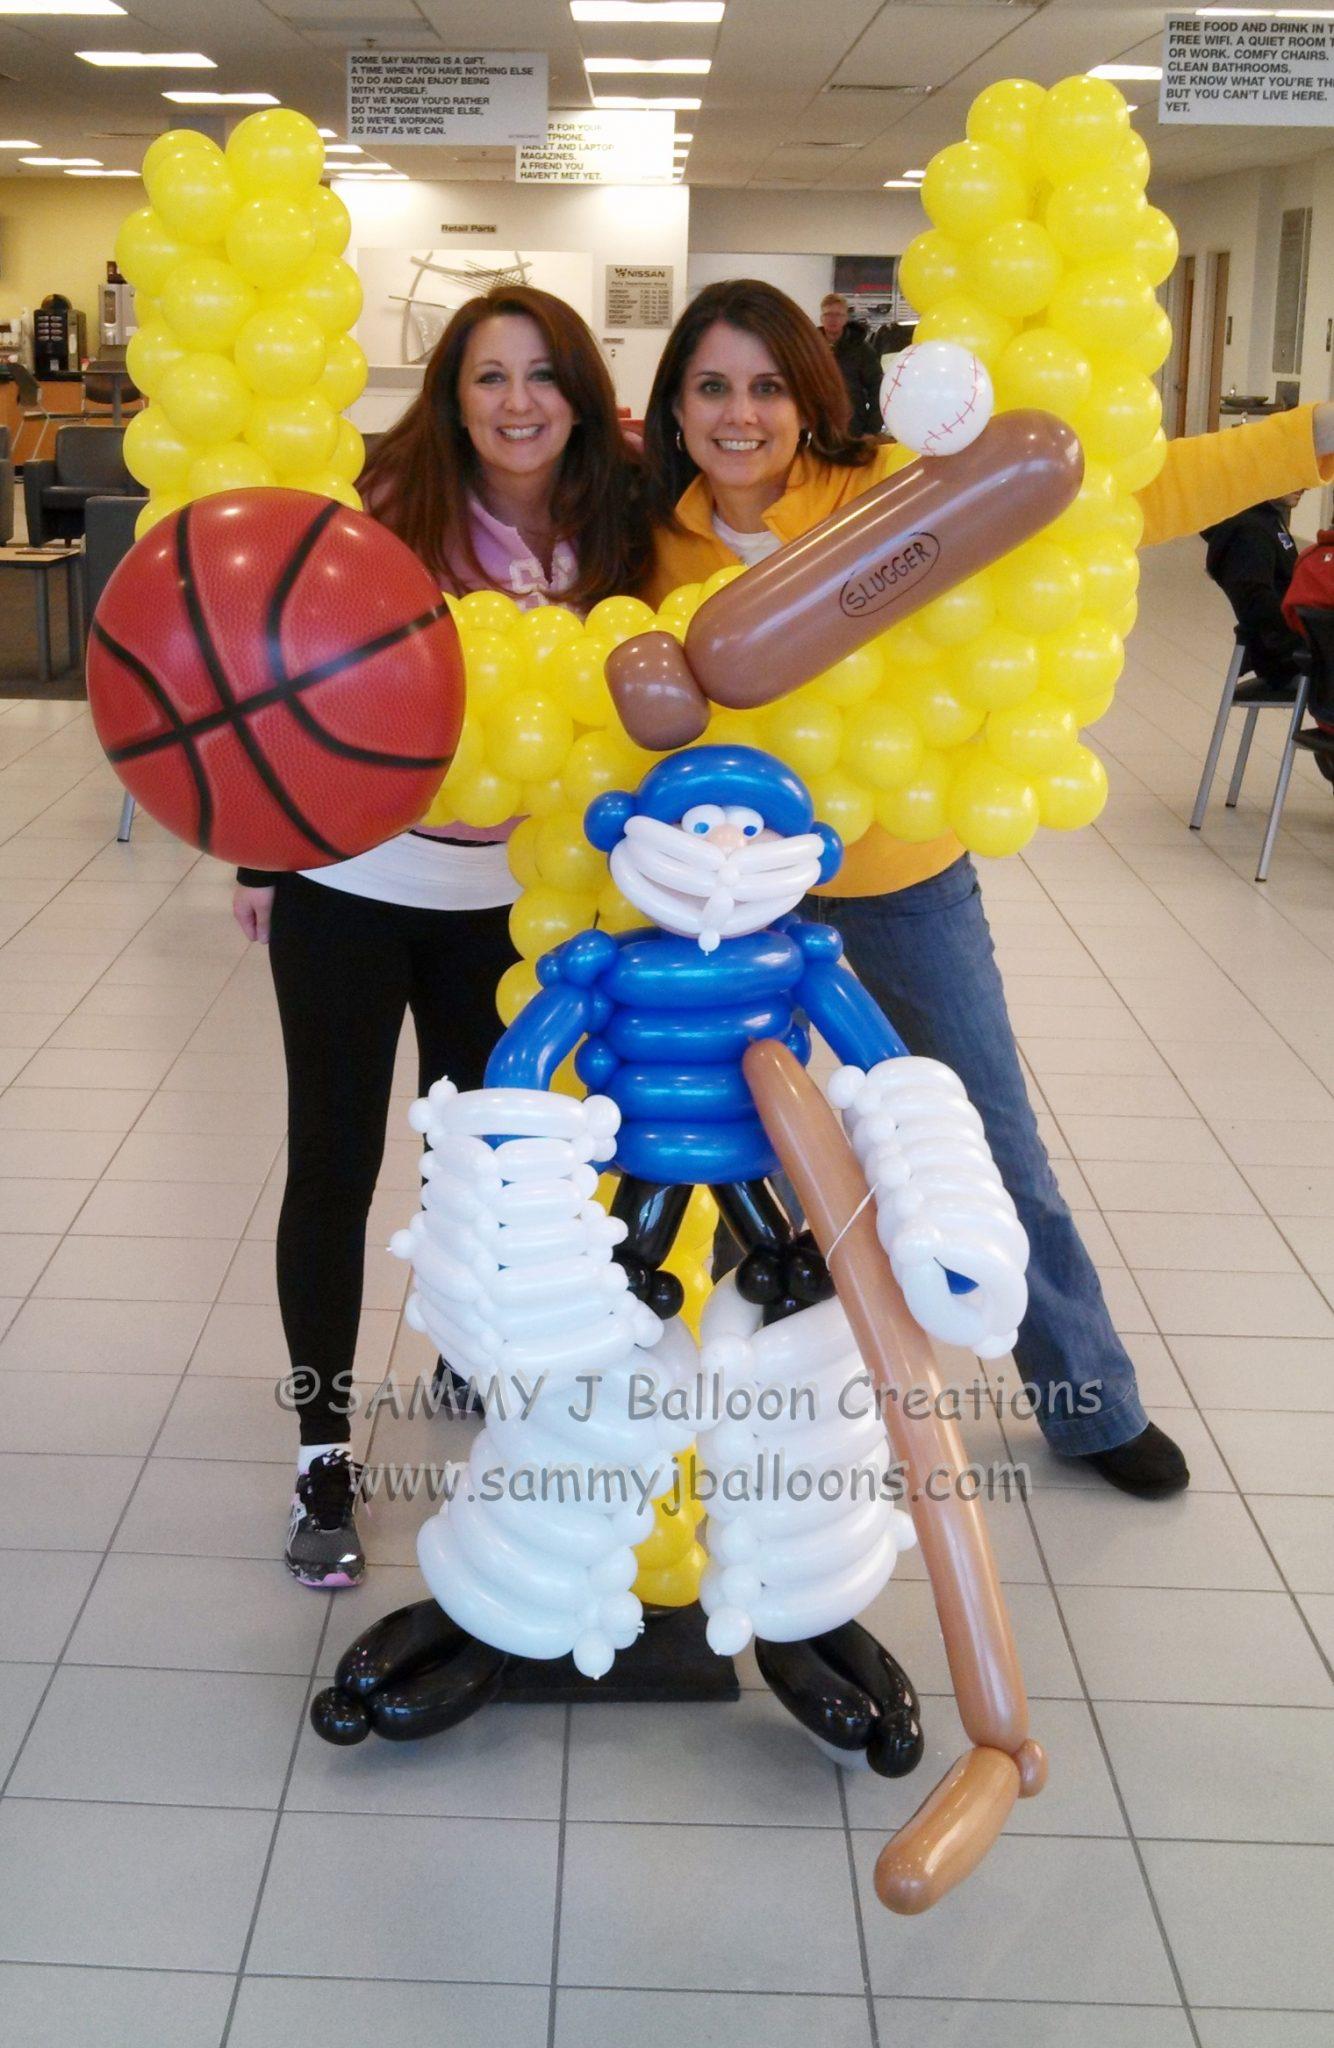 SAMMY J Balloon Creations st louis balloons sports football goal posts hockey goalie